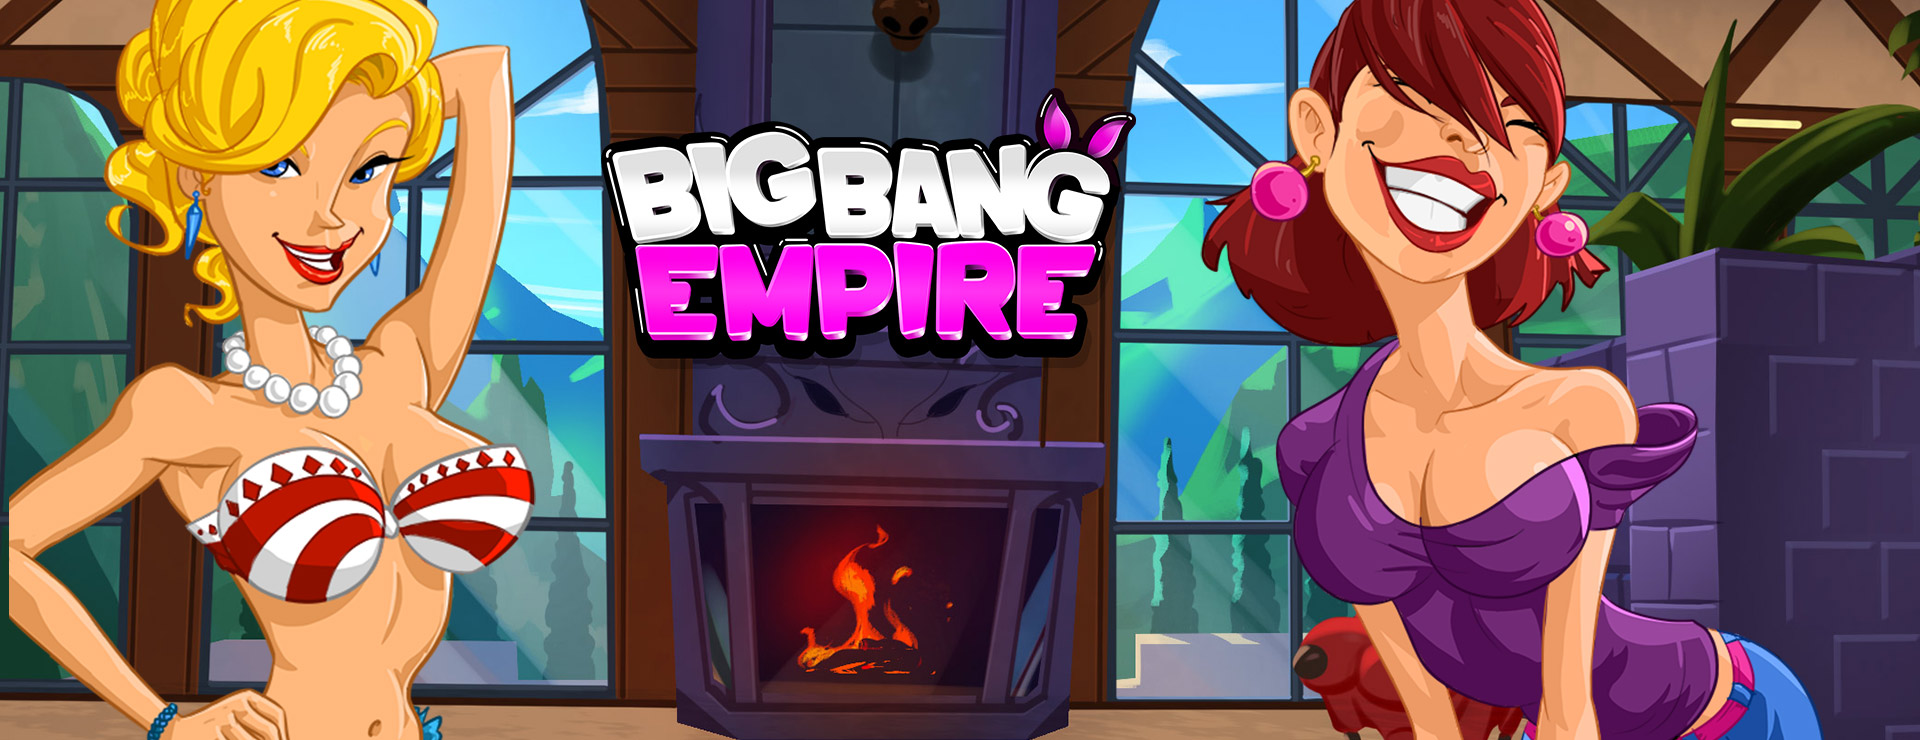 Big Bang Empire Online - RPG Game